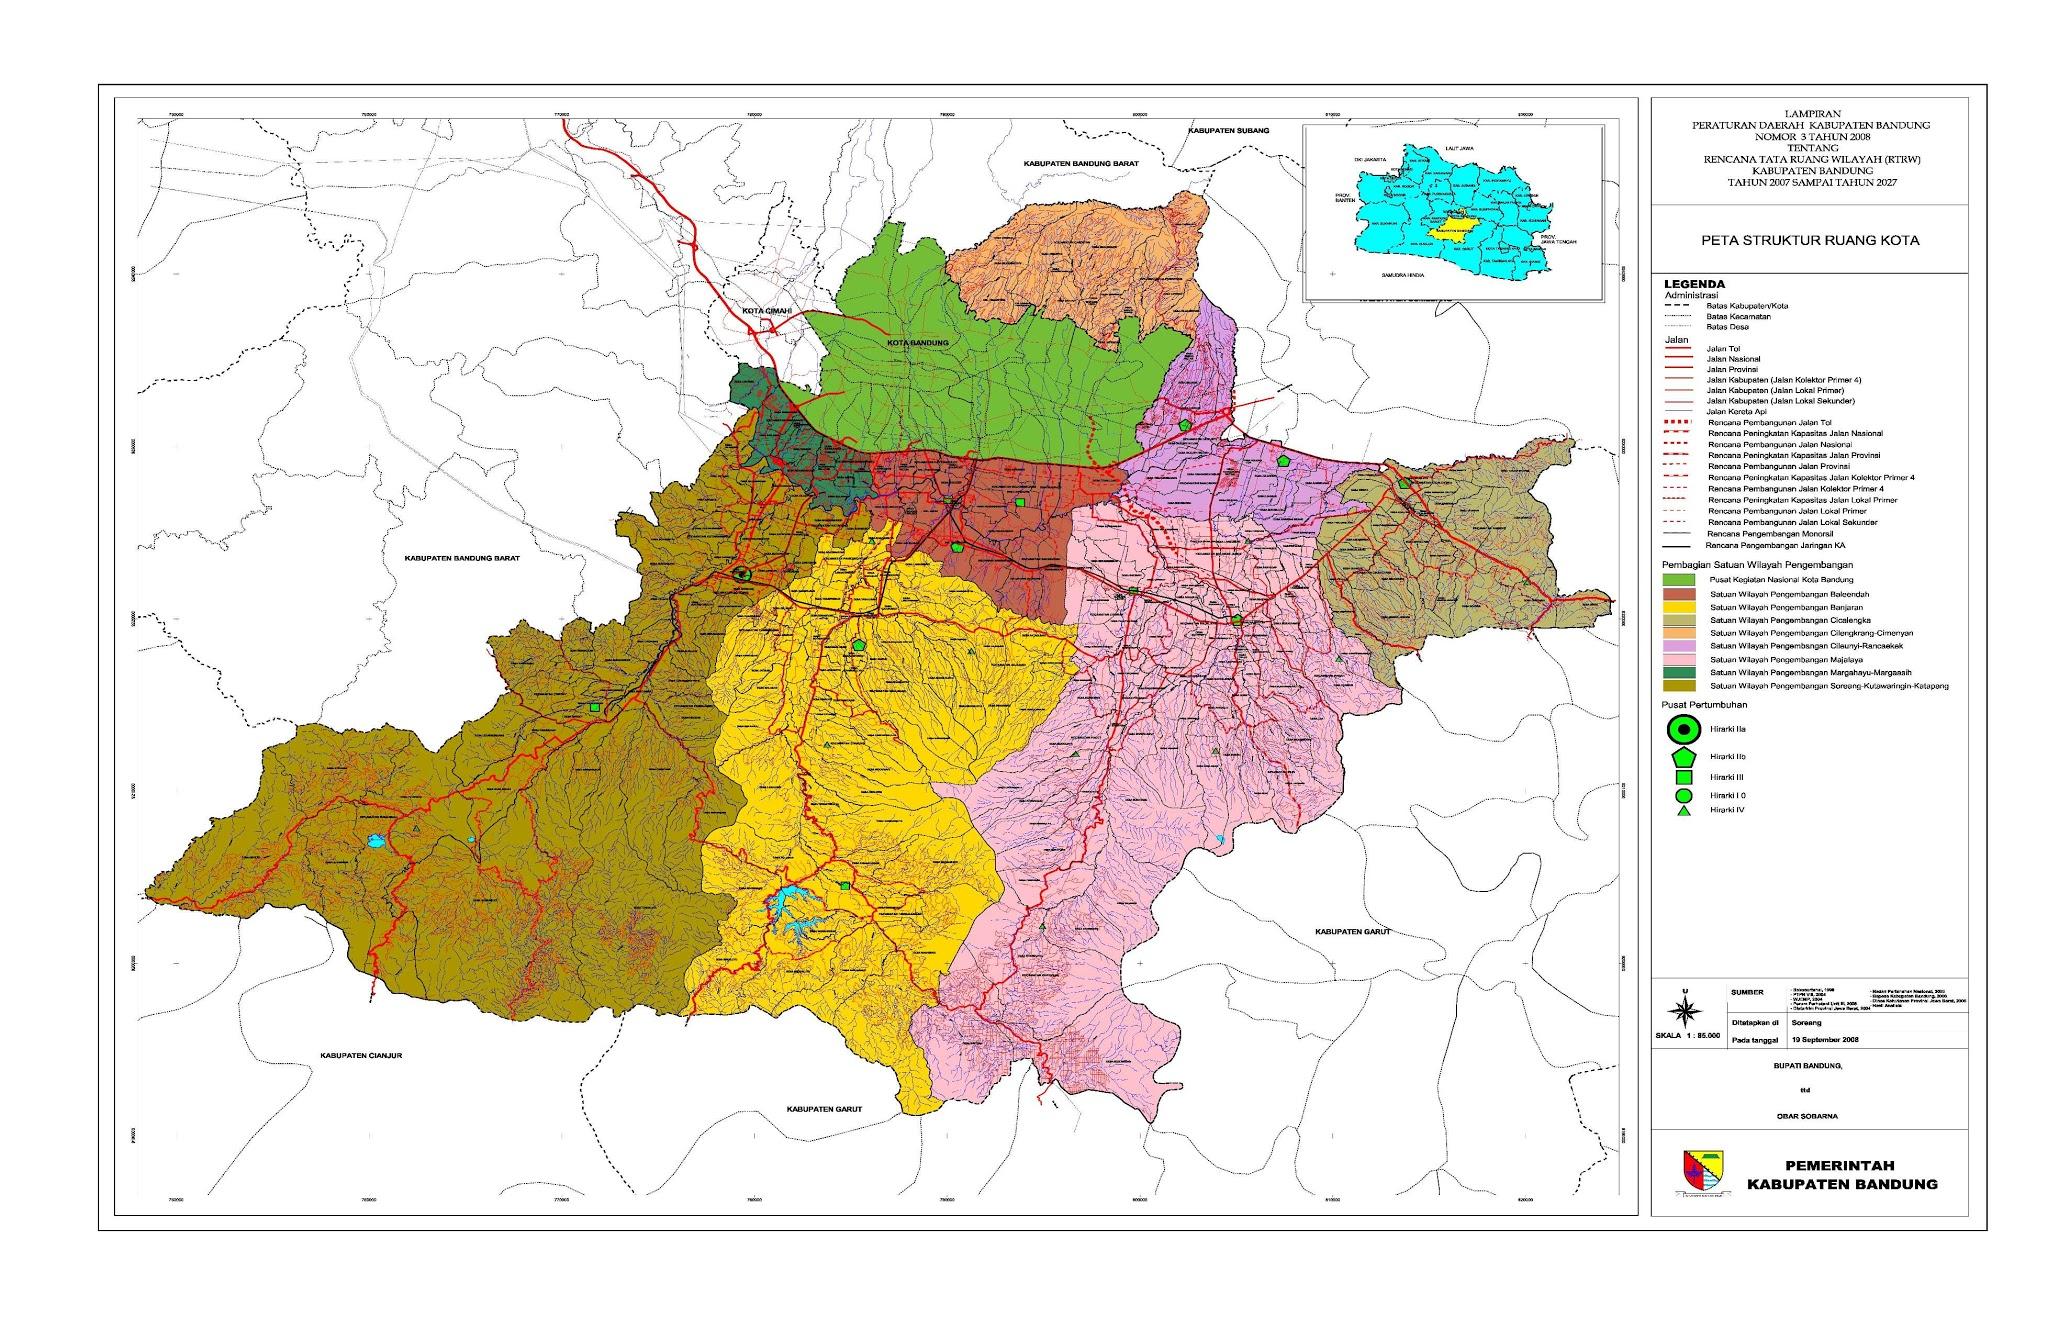 Peta Kota: Peta Kabupaten Bandung